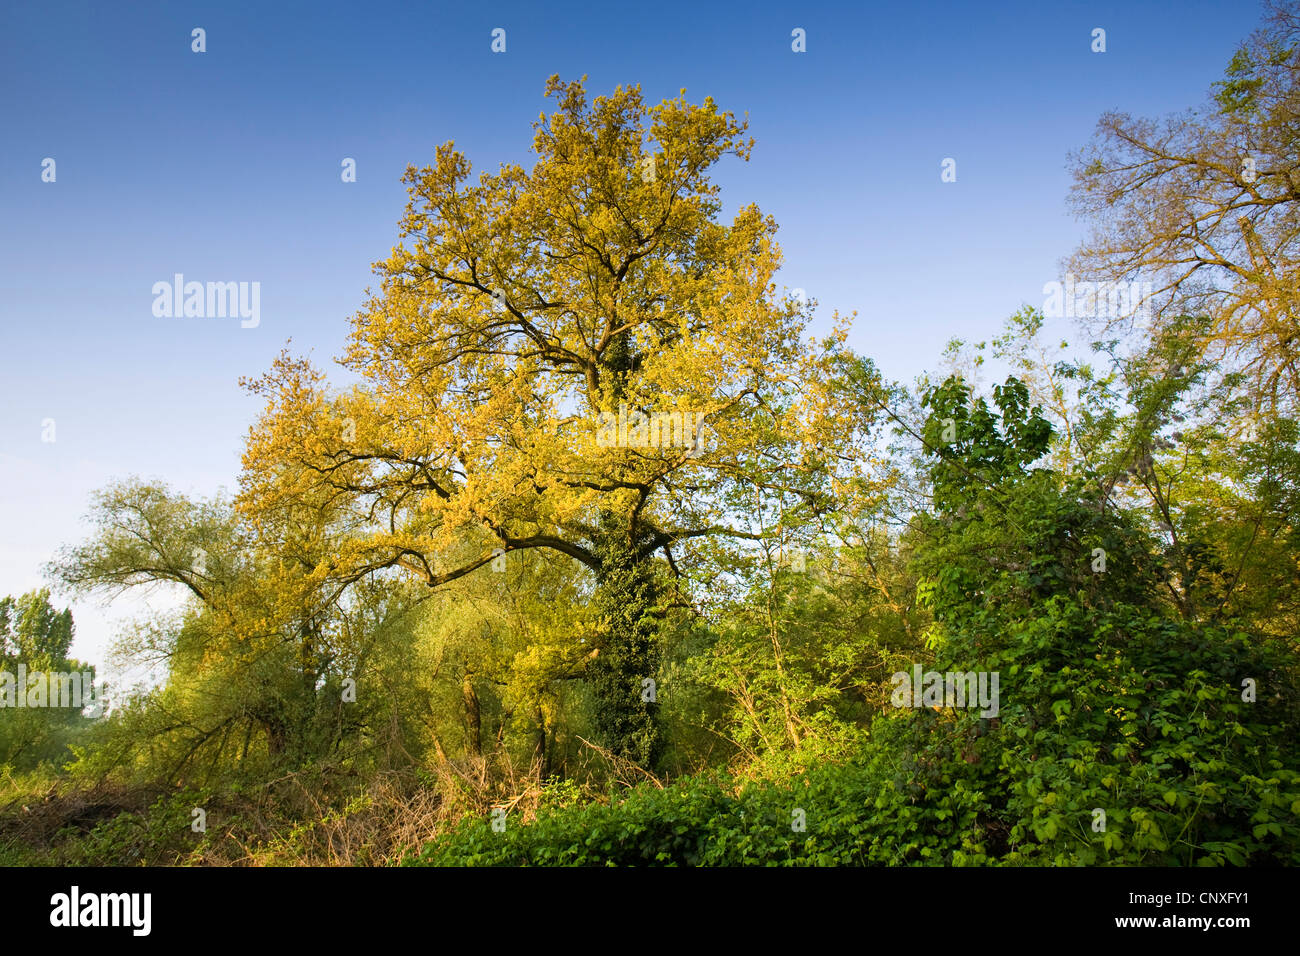 common oak, pedunculate oak, English oak (Quercus robur), oak in spring, Germany, Hesse, NSG Kuehkopf-Knoblochsaue Stock Photo